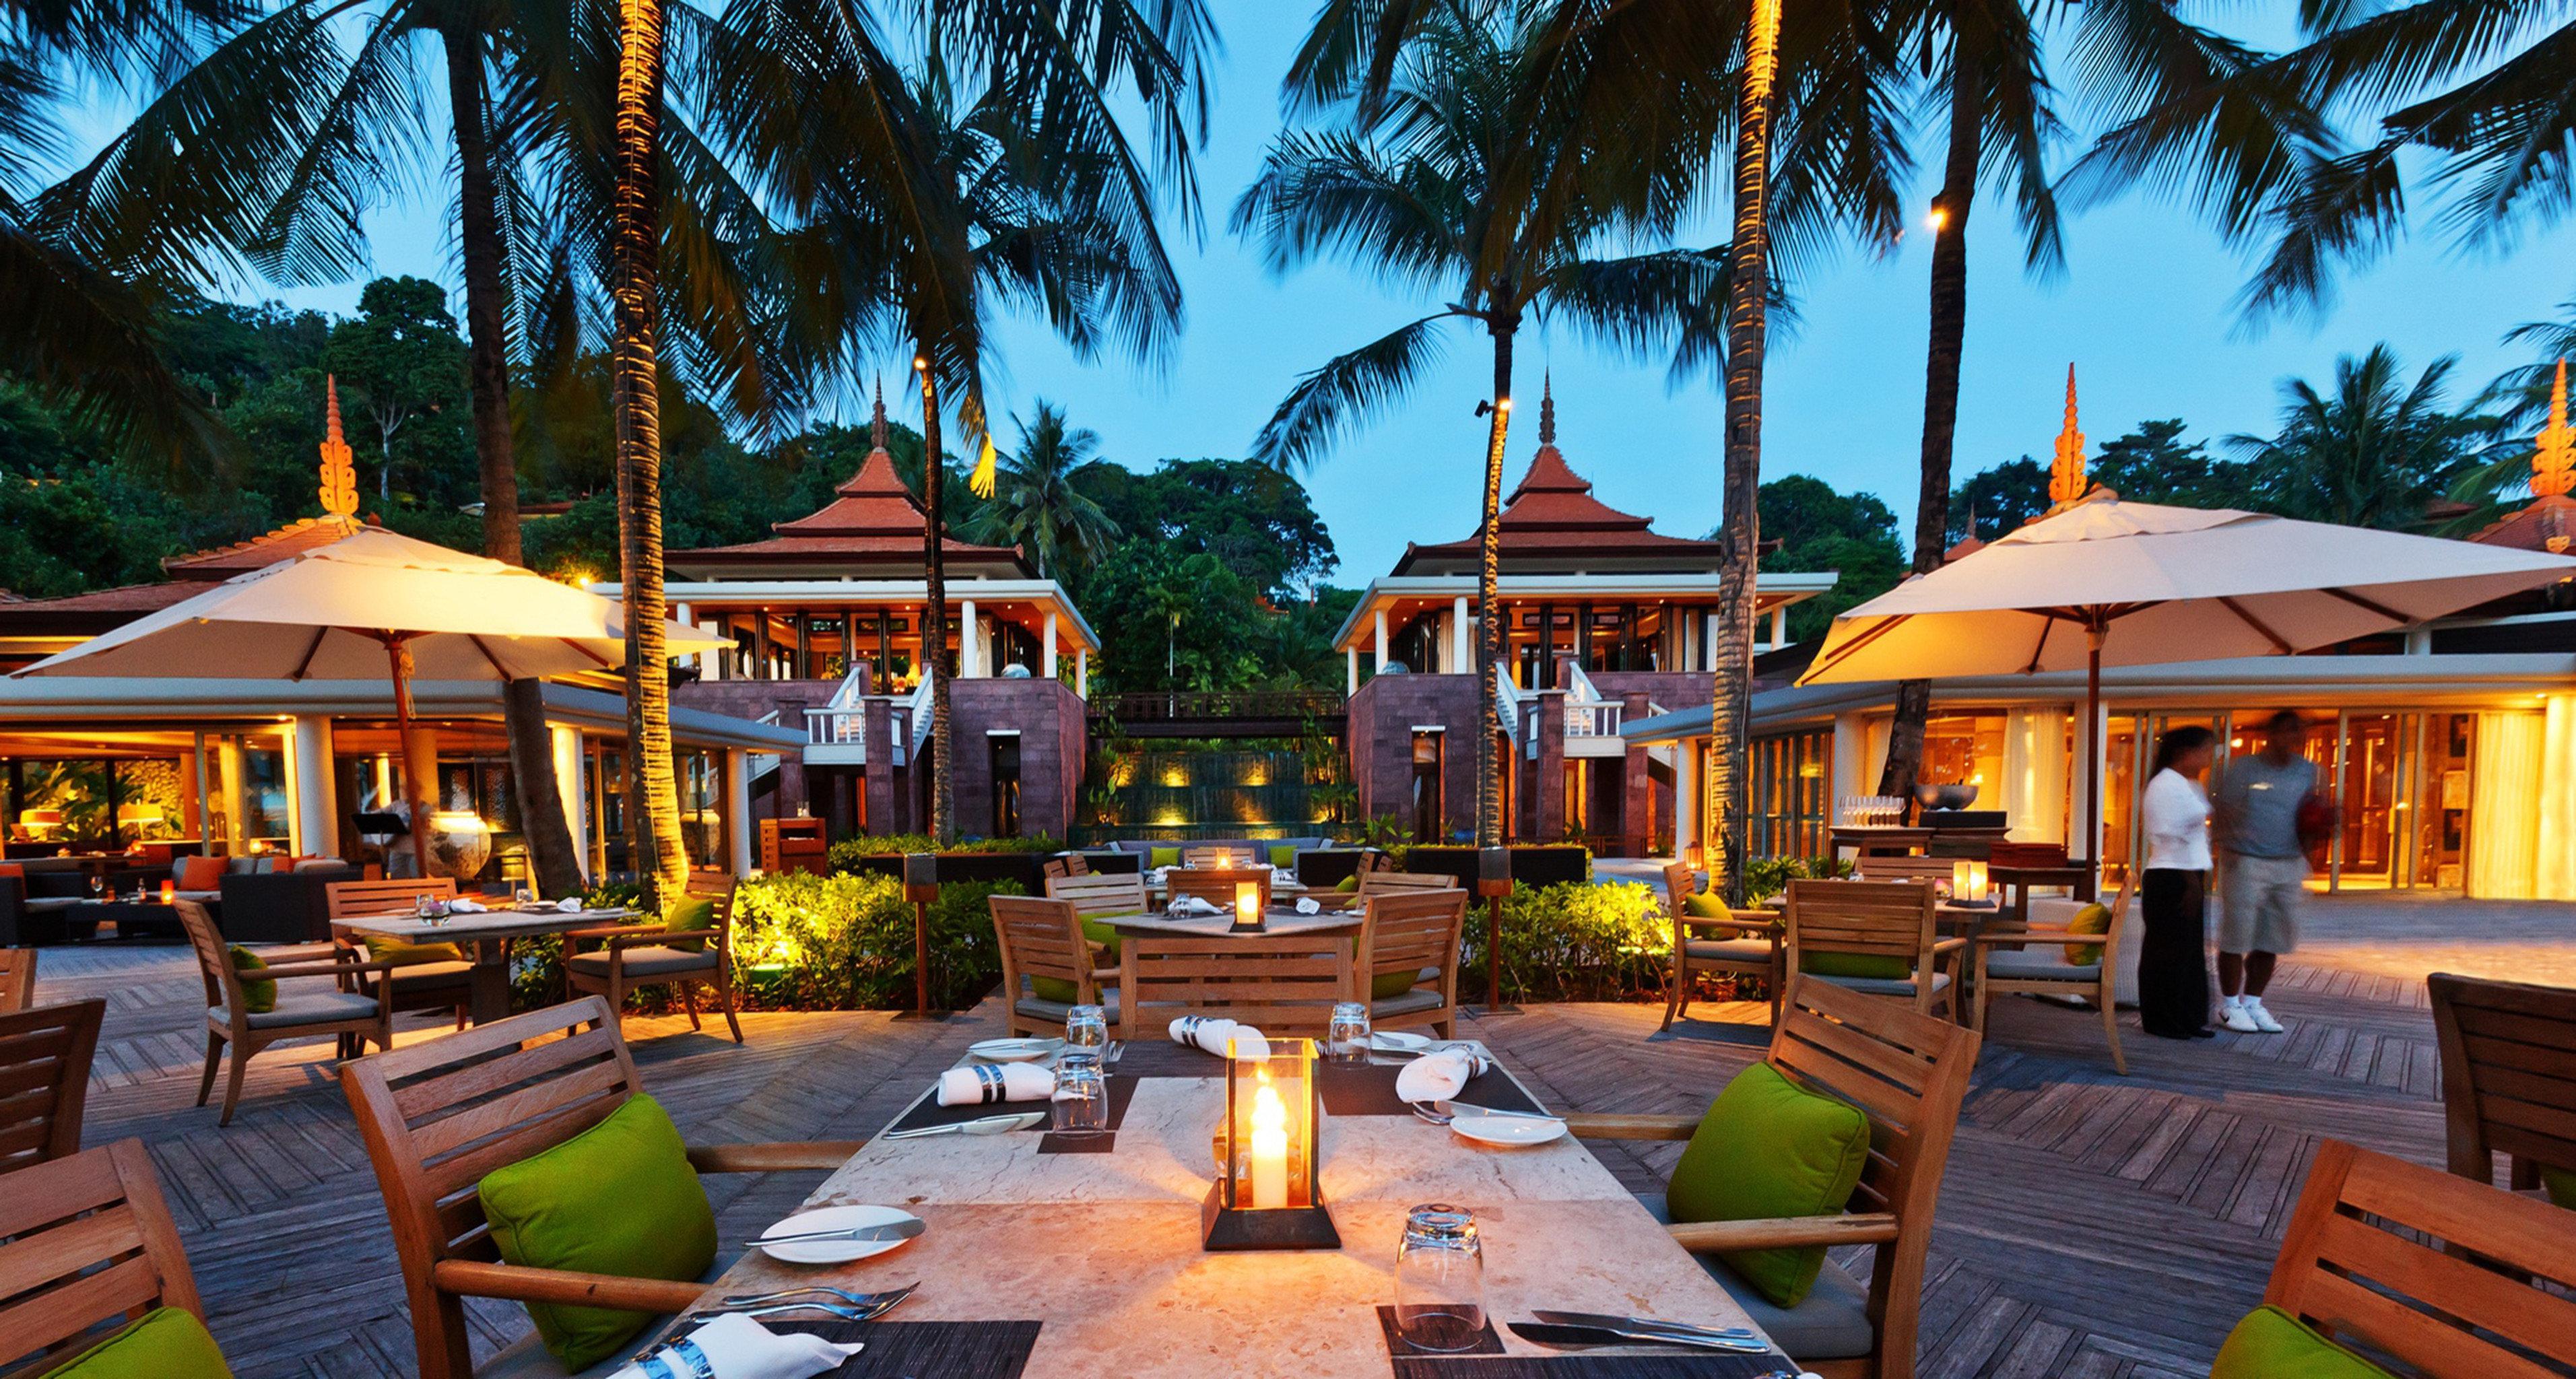 Bar Beach Dining Drink Eat Hotels Phuket Thailand Tropical tree outdoor leisure Resort estate vacation home restaurant real estate Village set lined furniture several